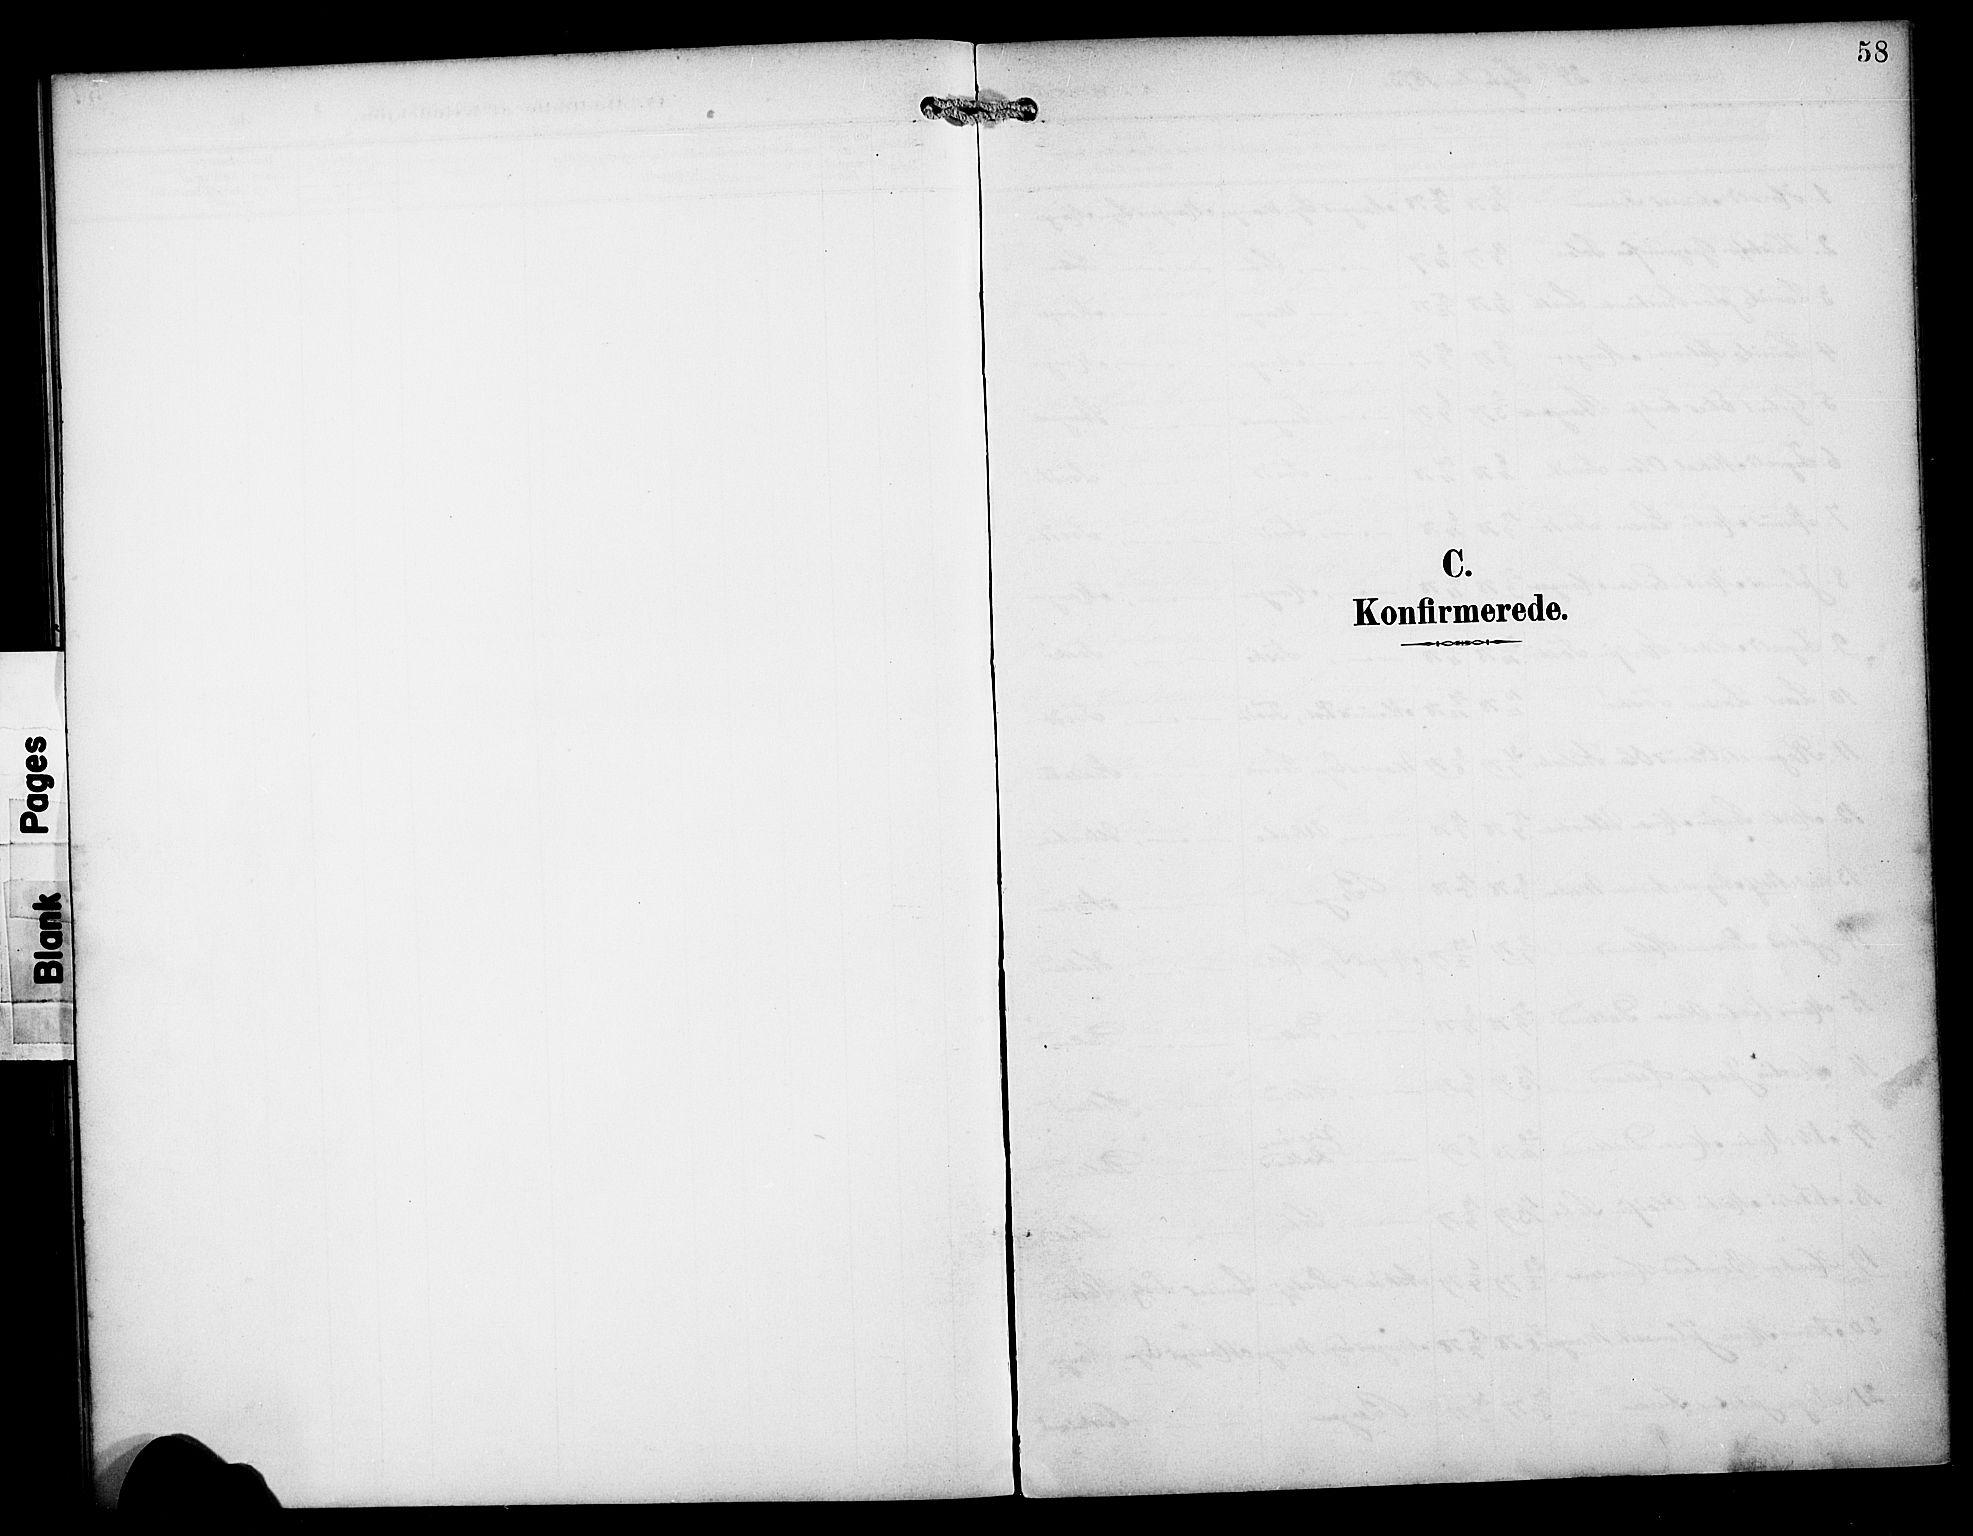 SAB, Manger sokneprestembete, H/Haa: Parish register (official) no. B 2, 1893-1906, p. 58